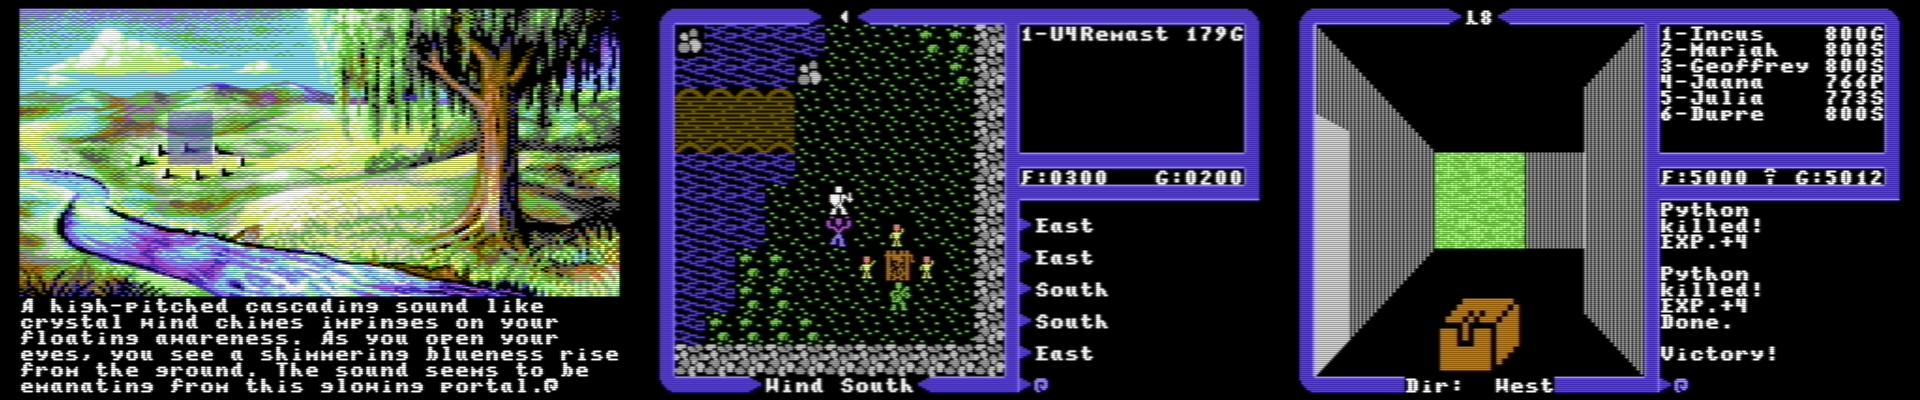 Ultima IV Remastered